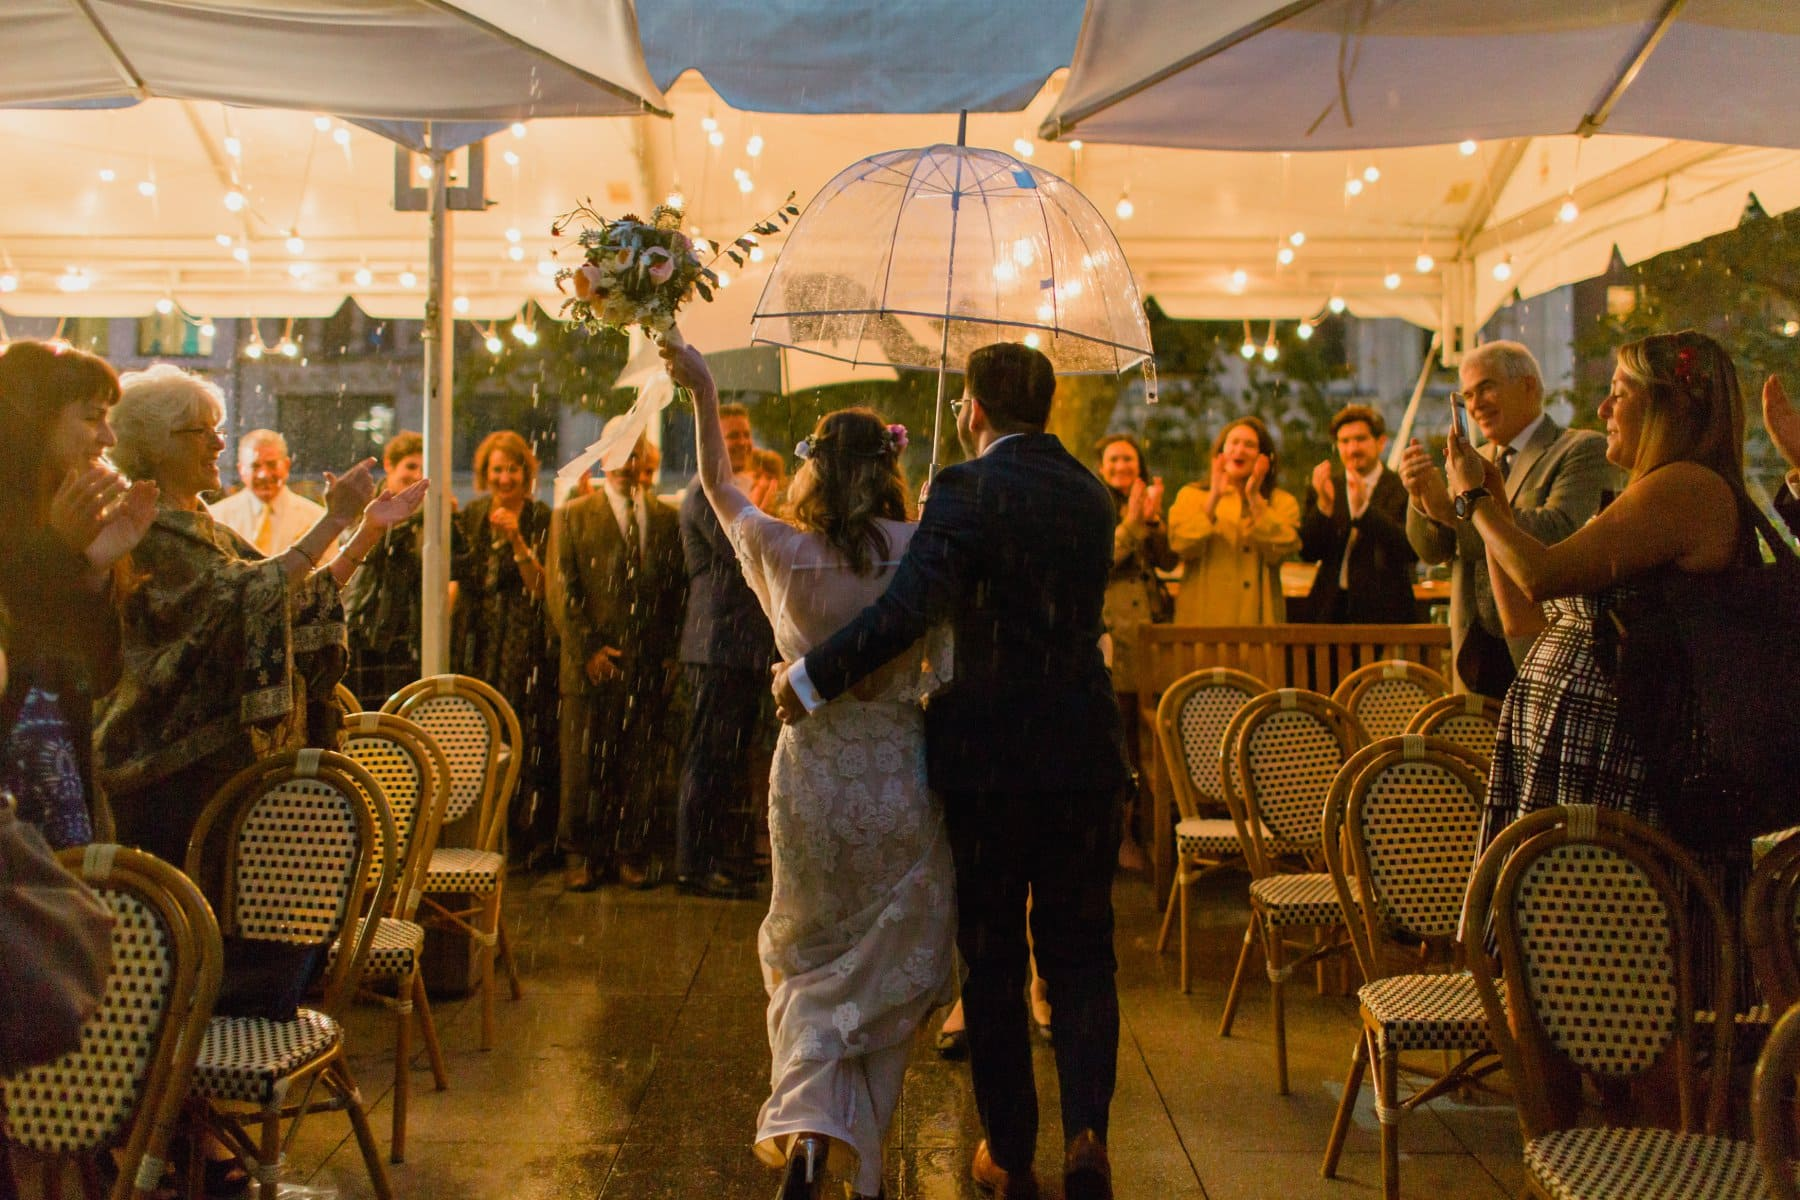 triumphant rainy recessional night time wedding ceremony Bryant Park Grill wedding